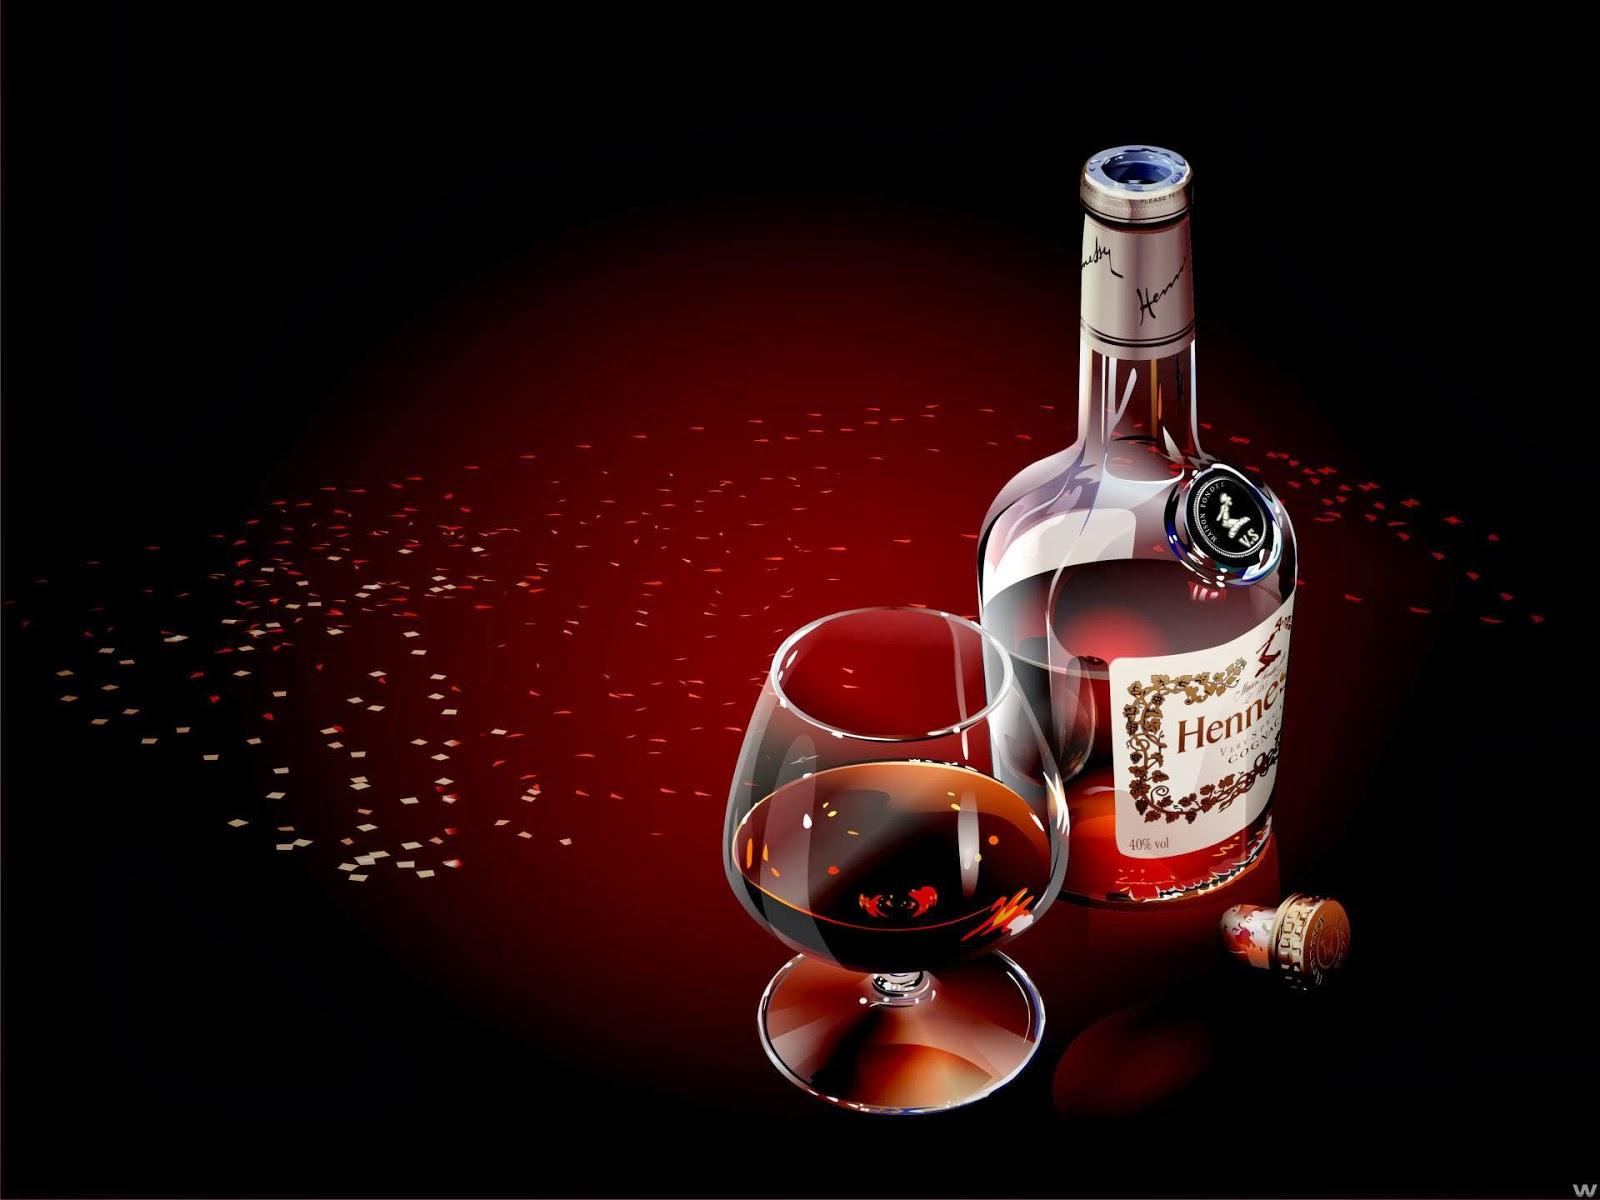 wallpaper wine red bottle - photo #17